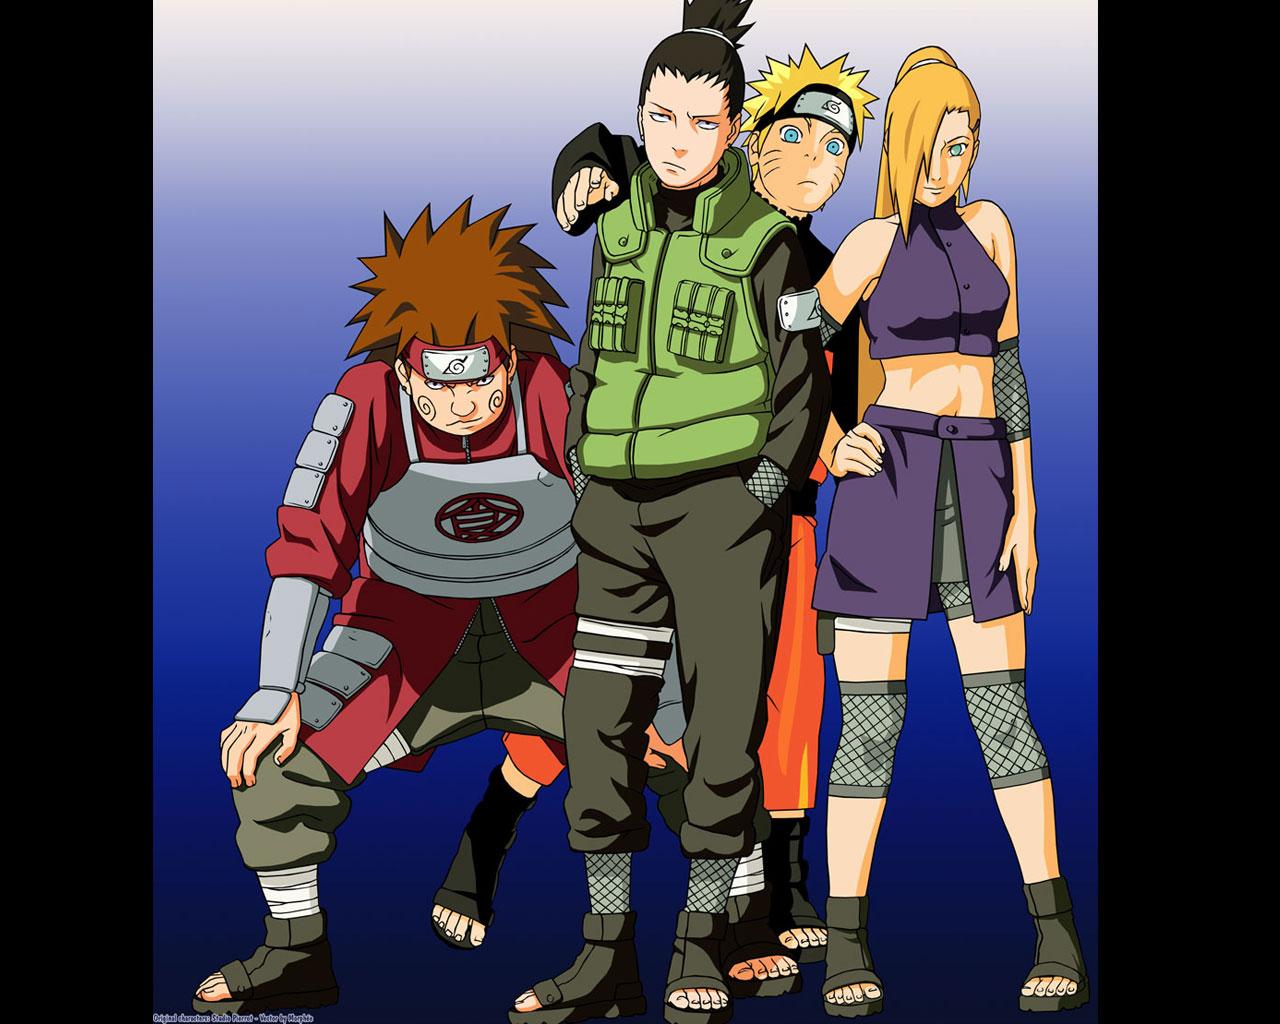 Naruto dating sim shikamaru ending a friendship 1